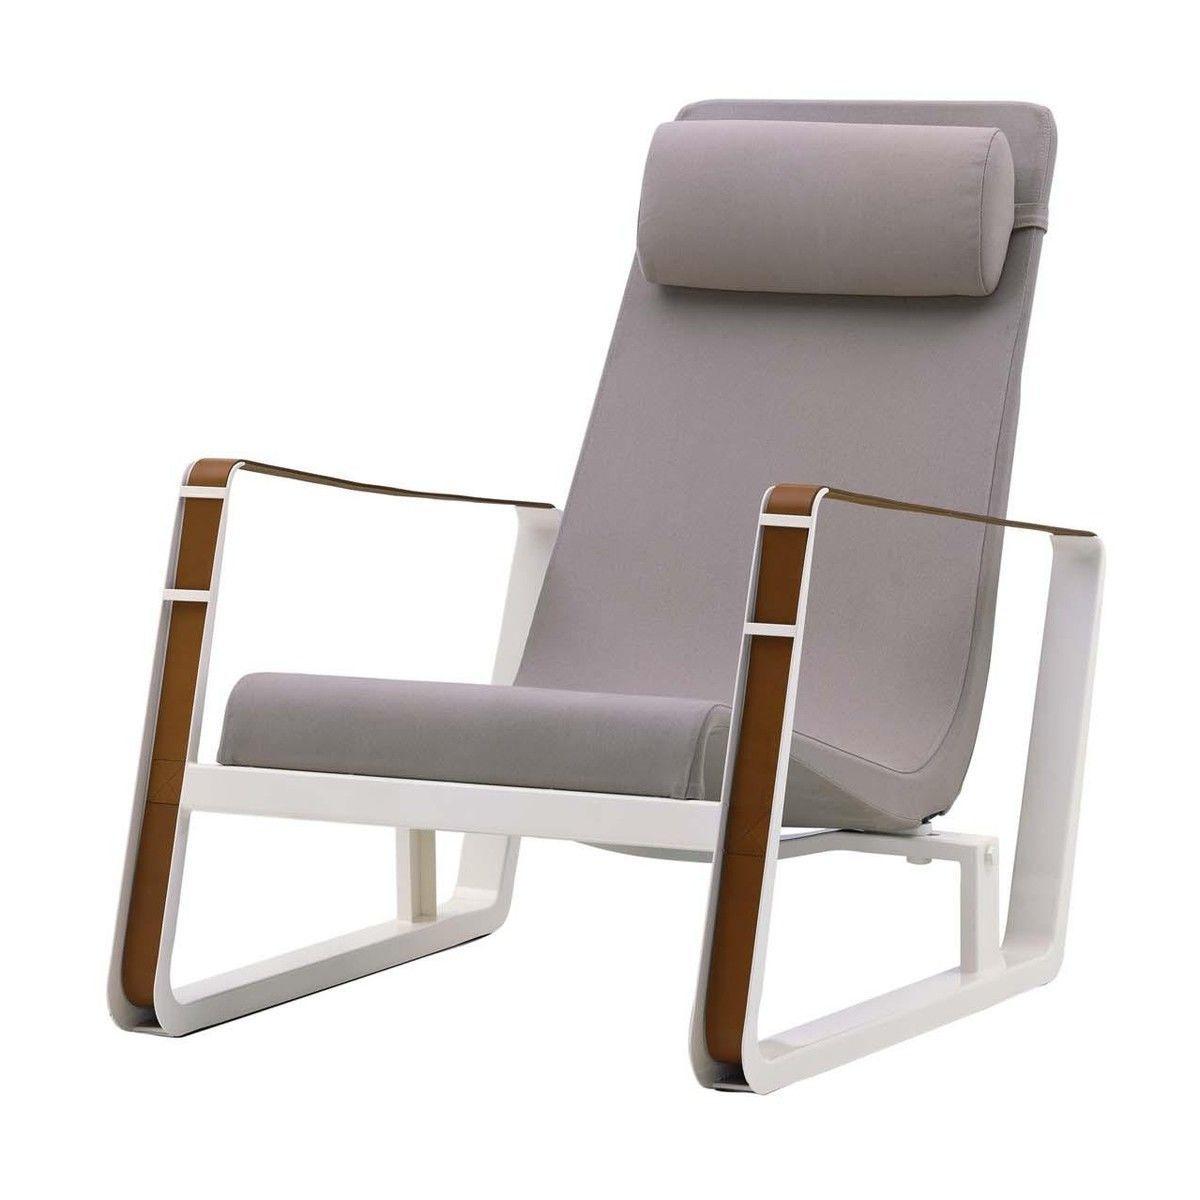 cit prouv sessel vitra. Black Bedroom Furniture Sets. Home Design Ideas